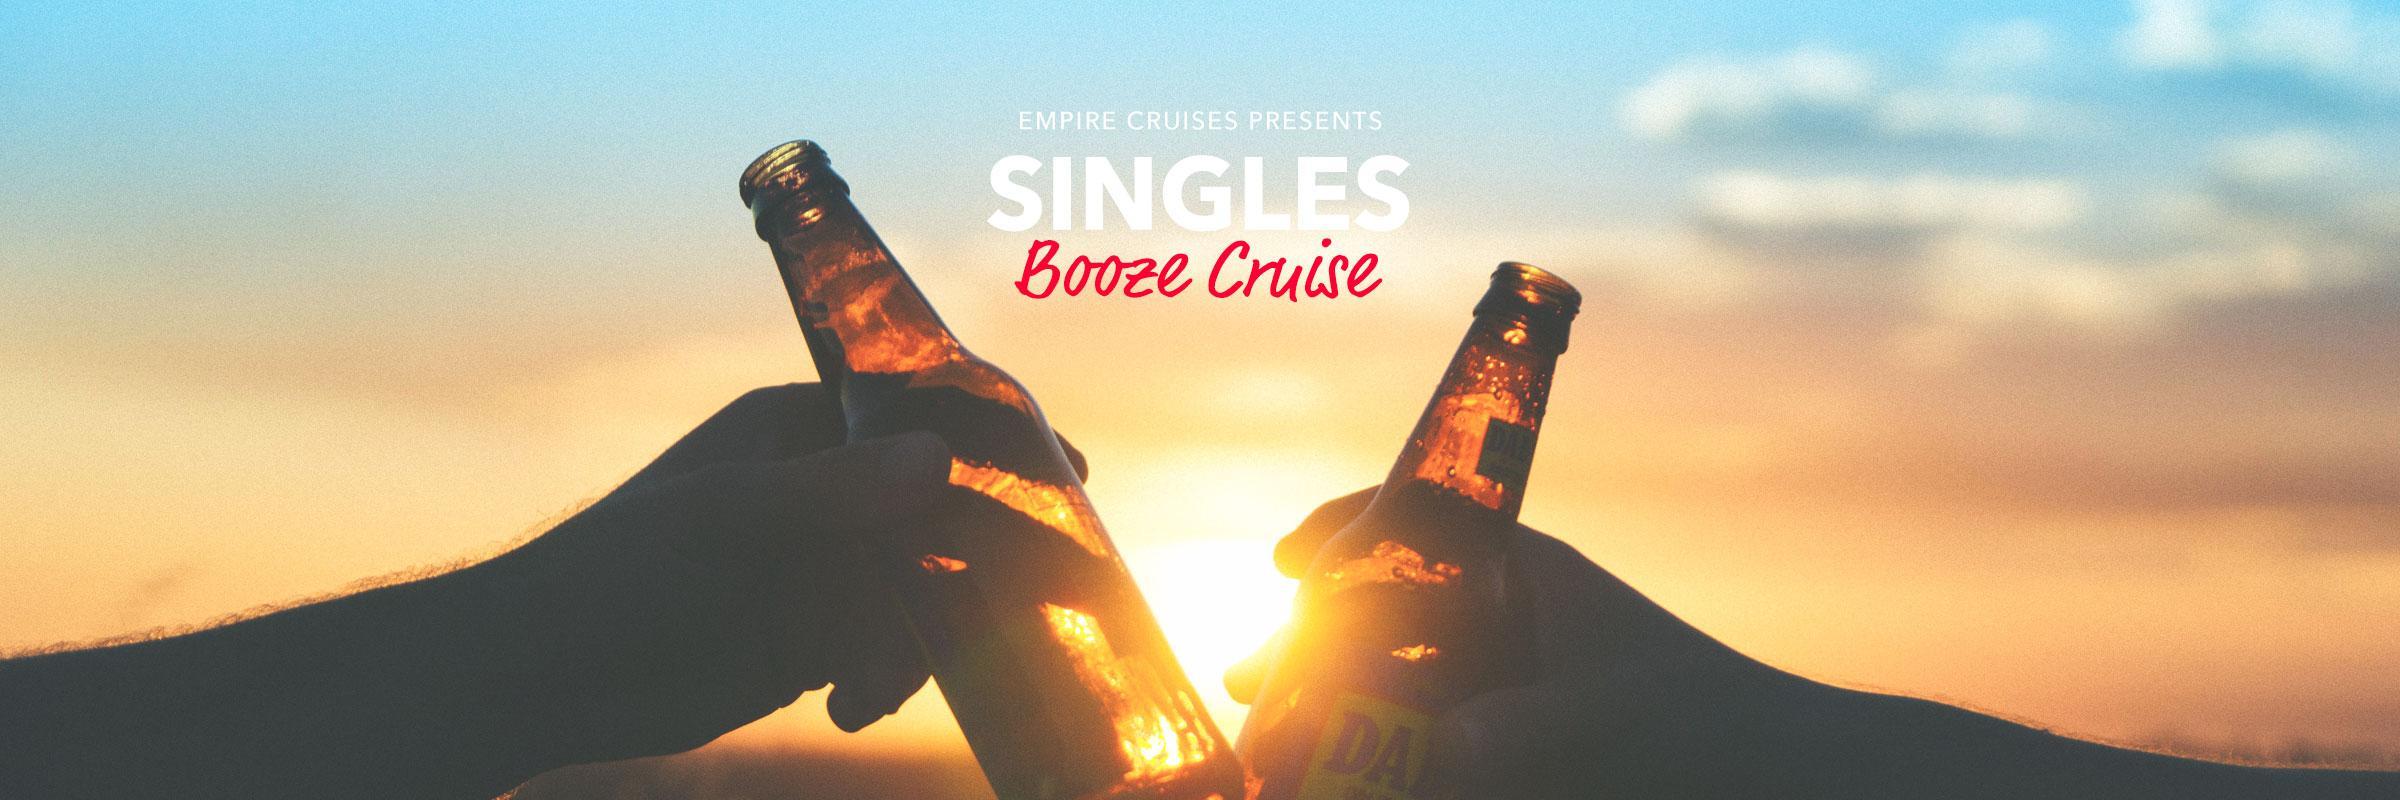 Singles Booze Cruise